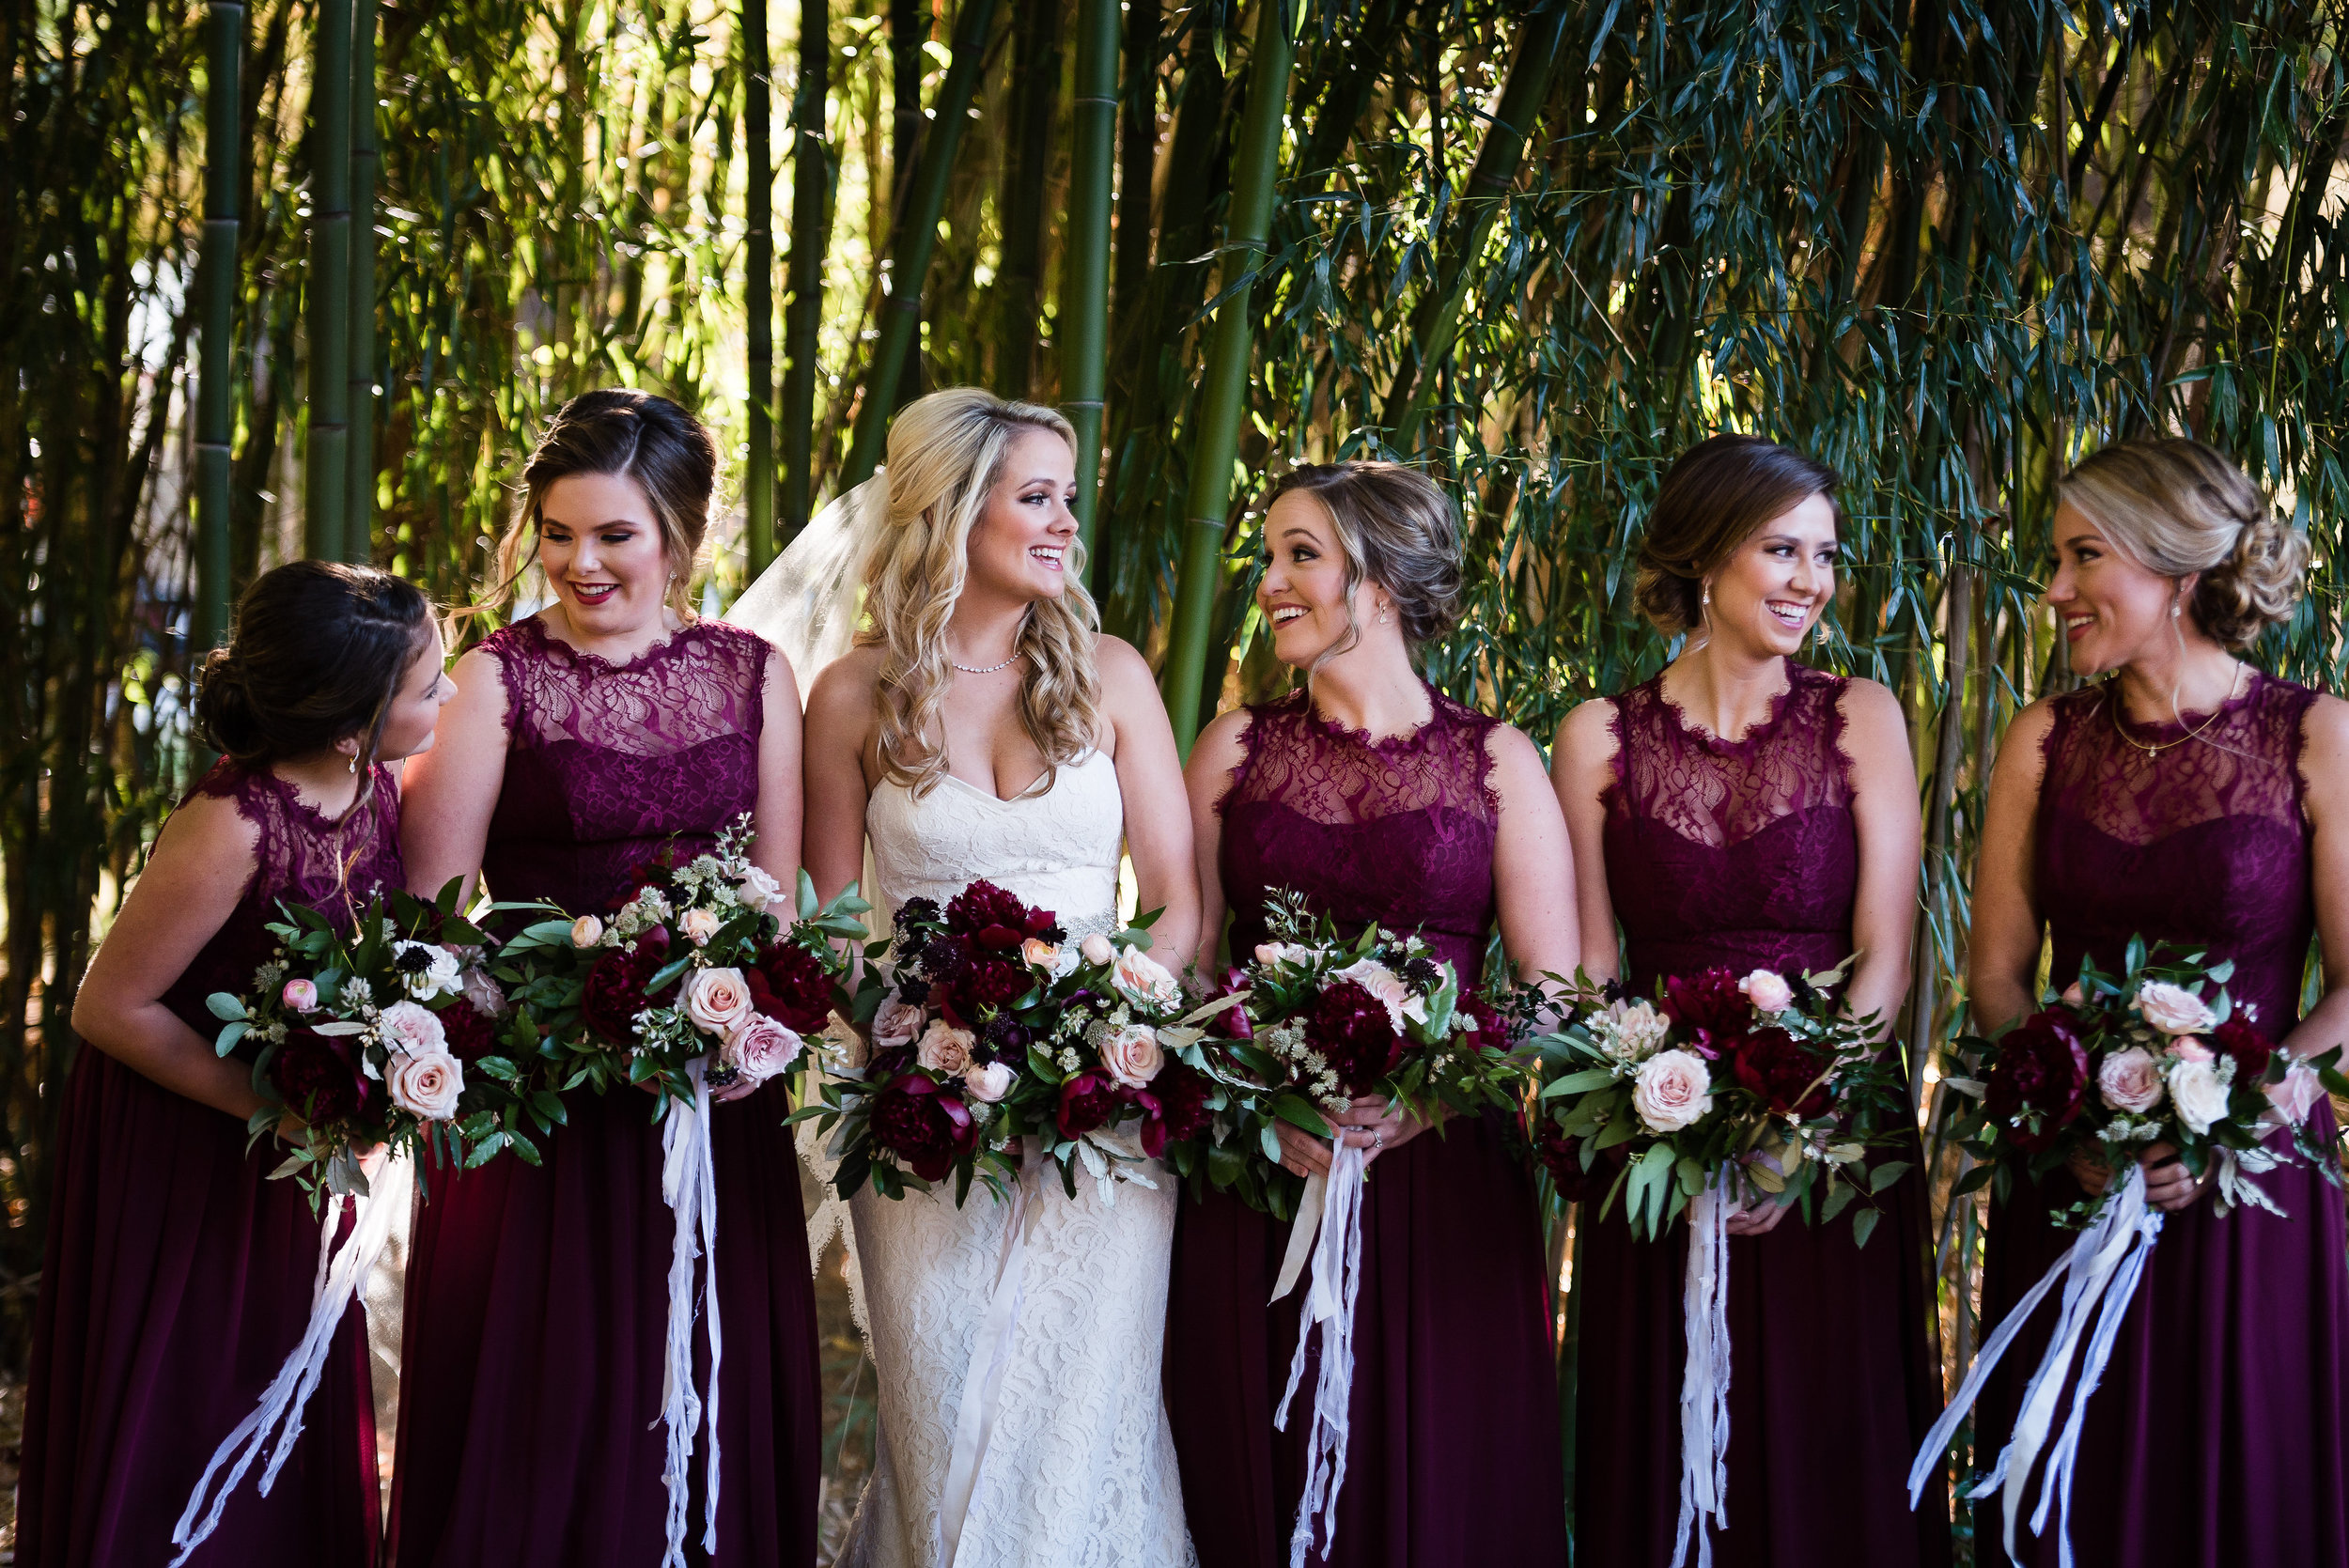 20161022_hawkesdene_fall_wedding_photos_0413.jpg